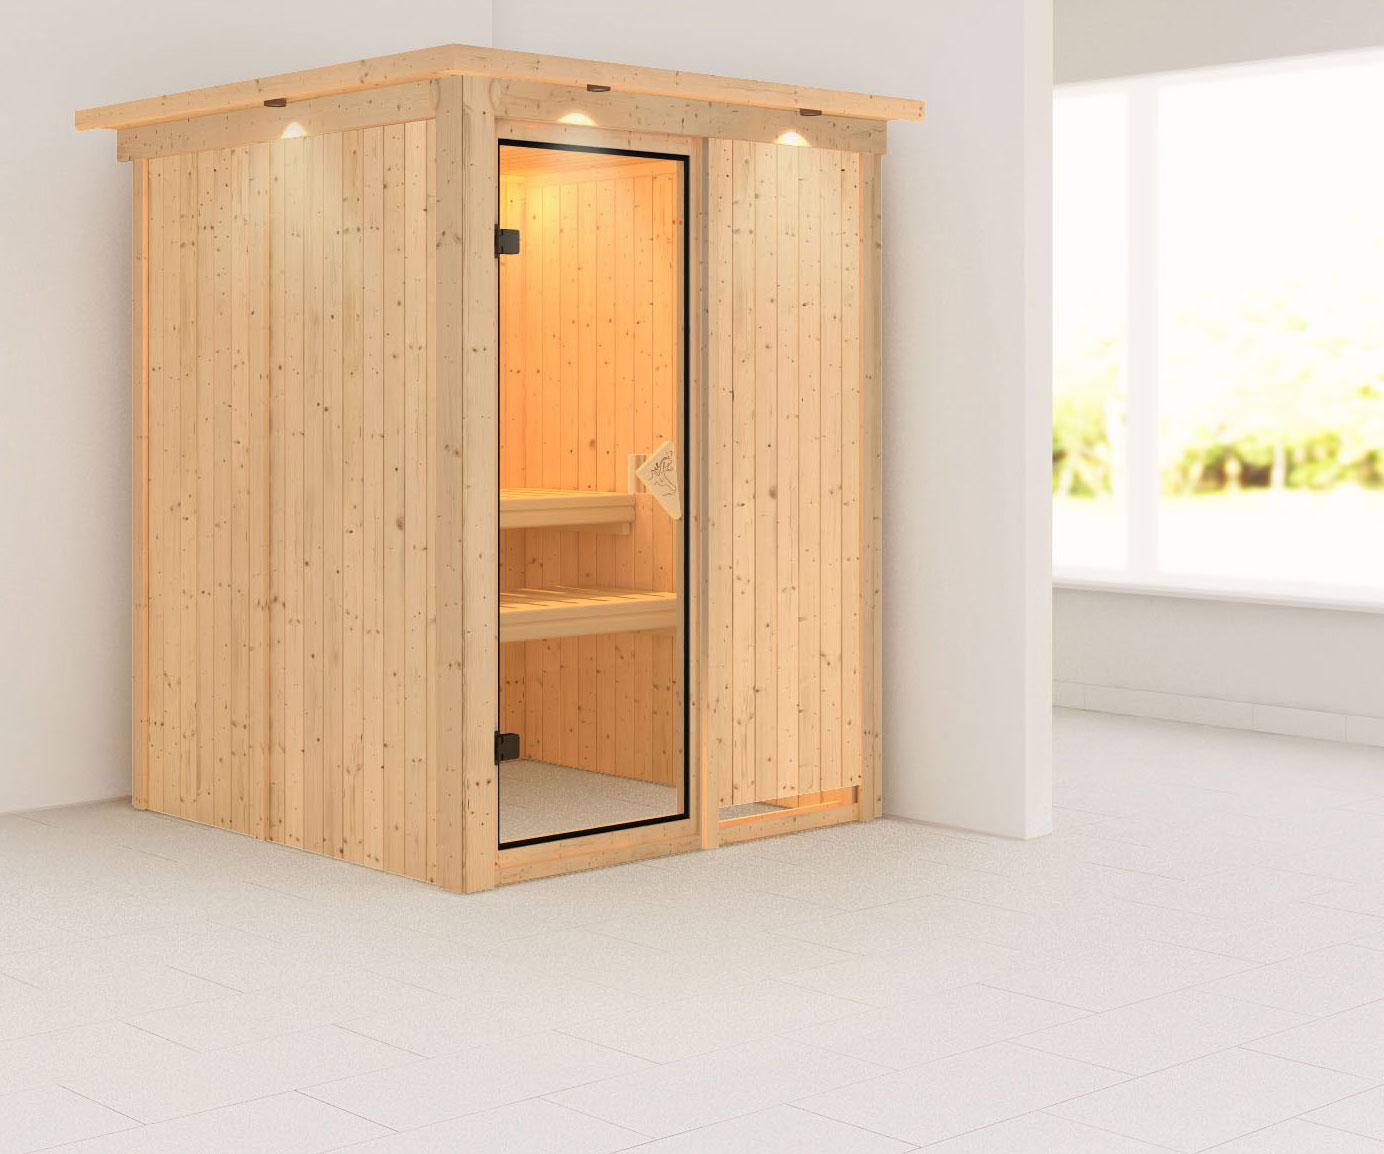 Karibu Sauna Norin 68mm Dachkranz ohne Saunaofen classic Tür Bild 1